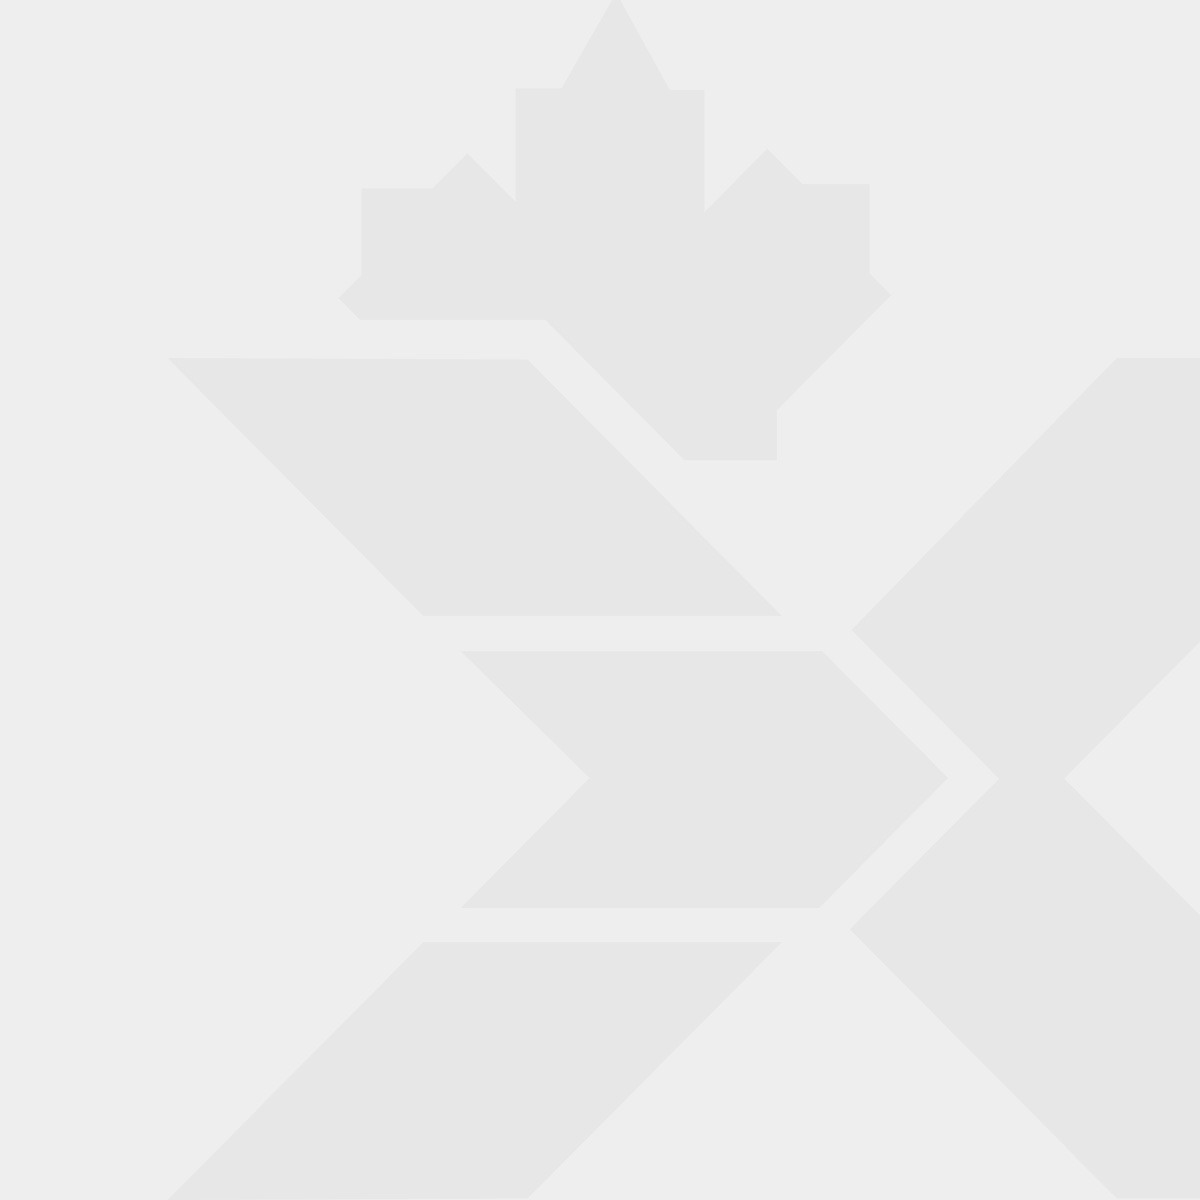 CADTC KINGSTON - H2X-DRY® LONG SLEEVE JERSEY